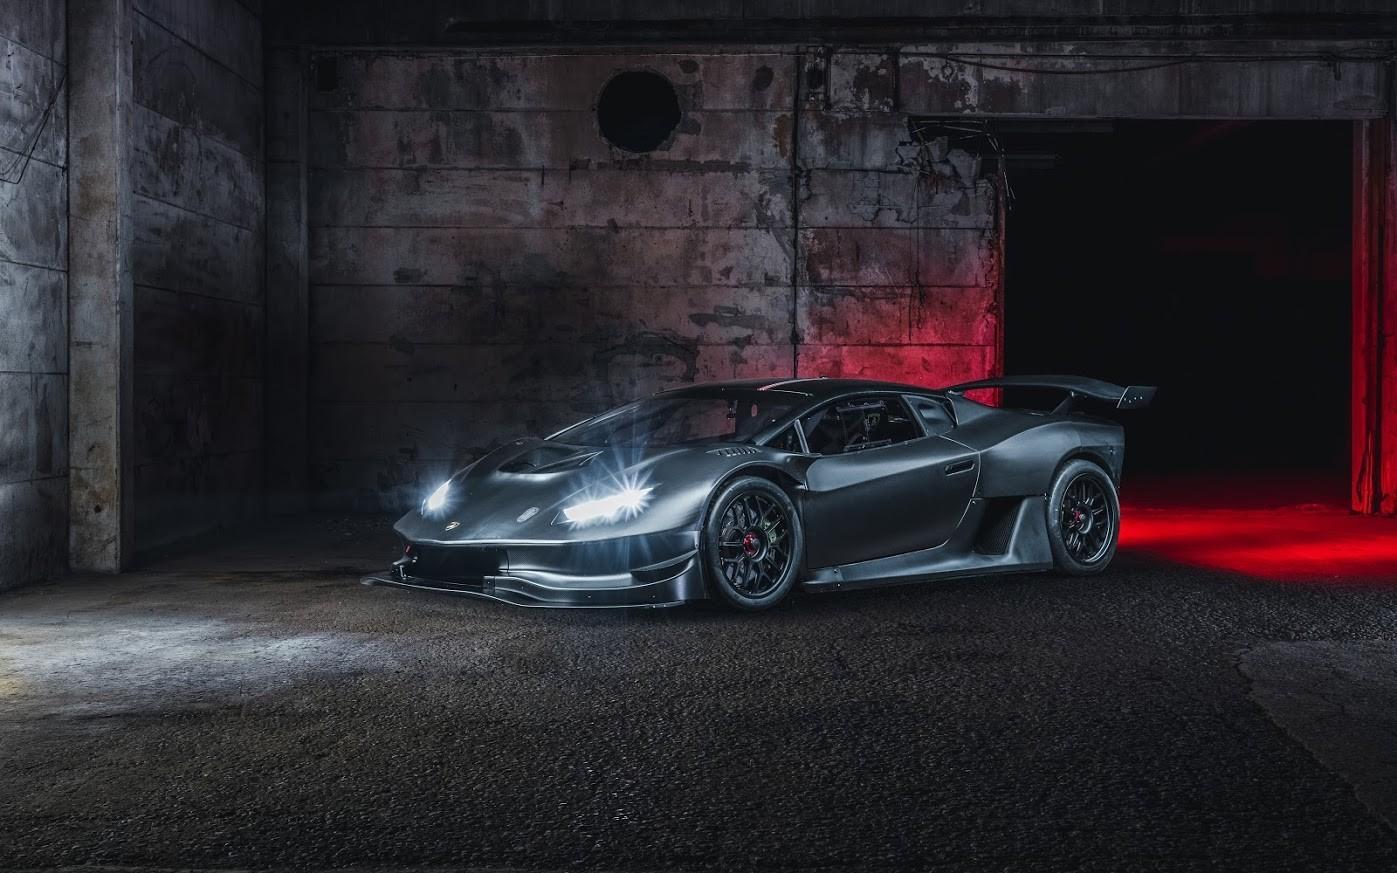 Zyrus-Engineering-Lamborghini-Huracan-LP1200-for-sale-15